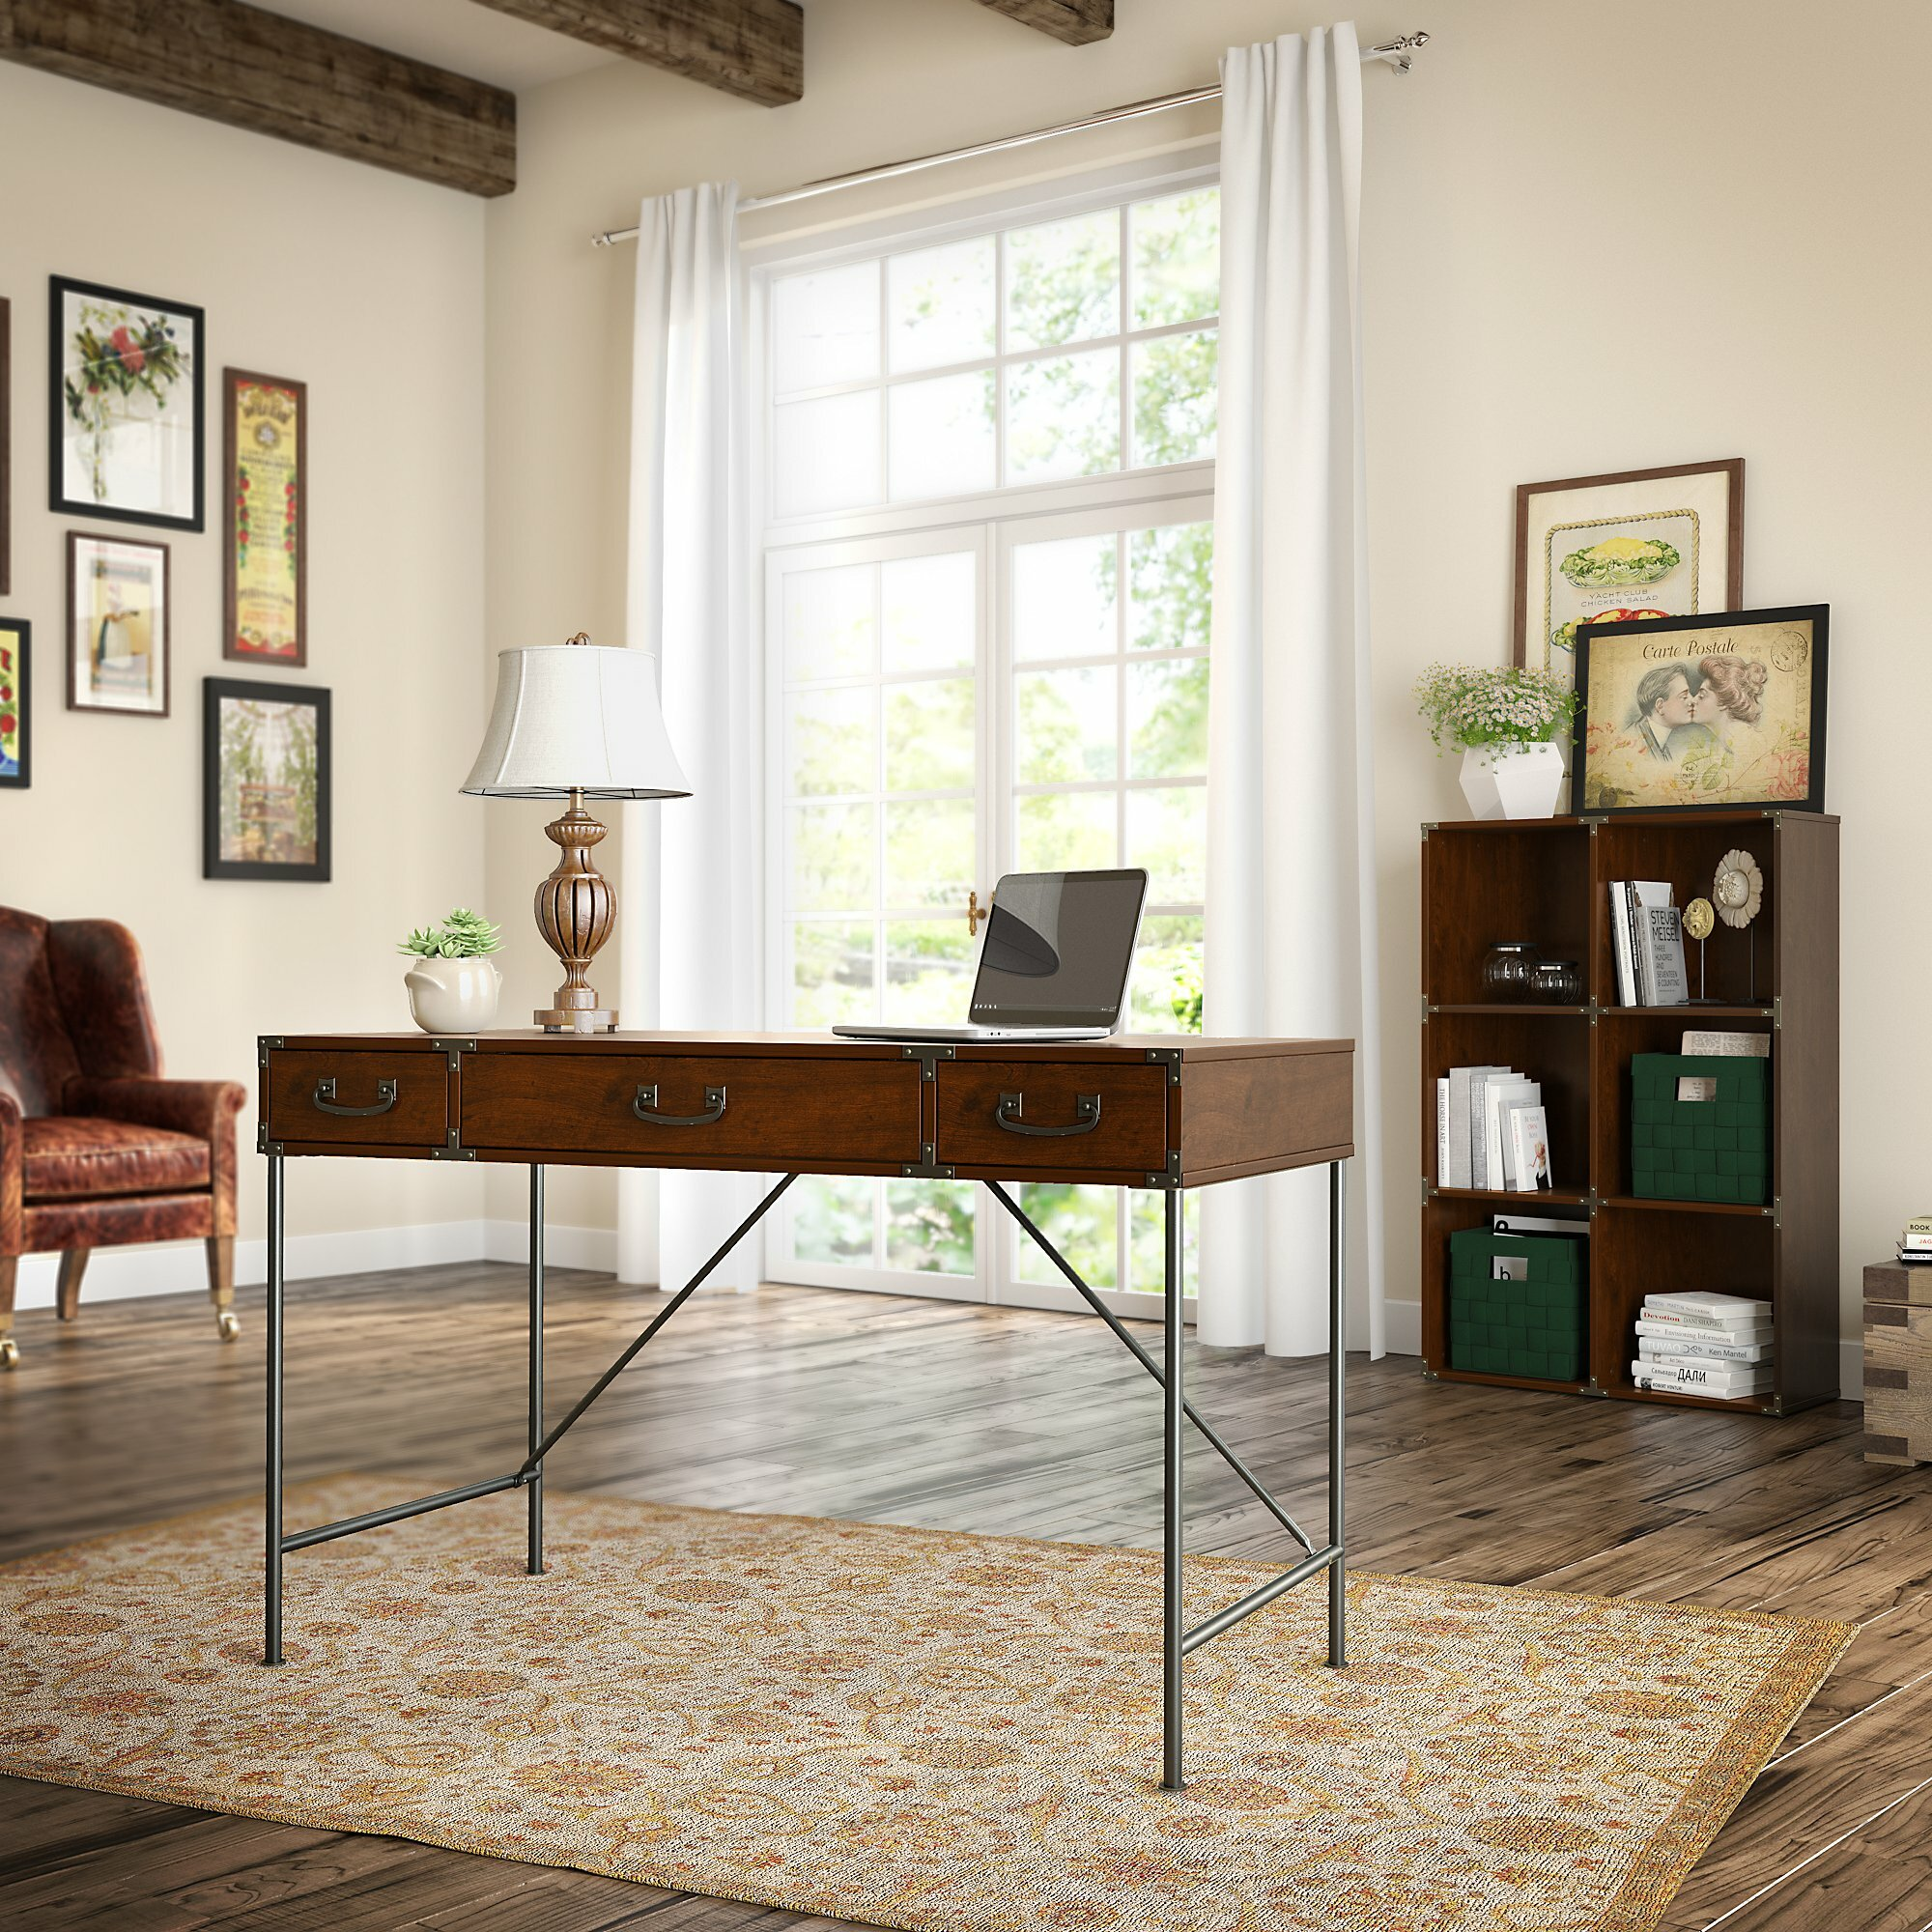 Kathy ireland office by bush ironworks 2 piece